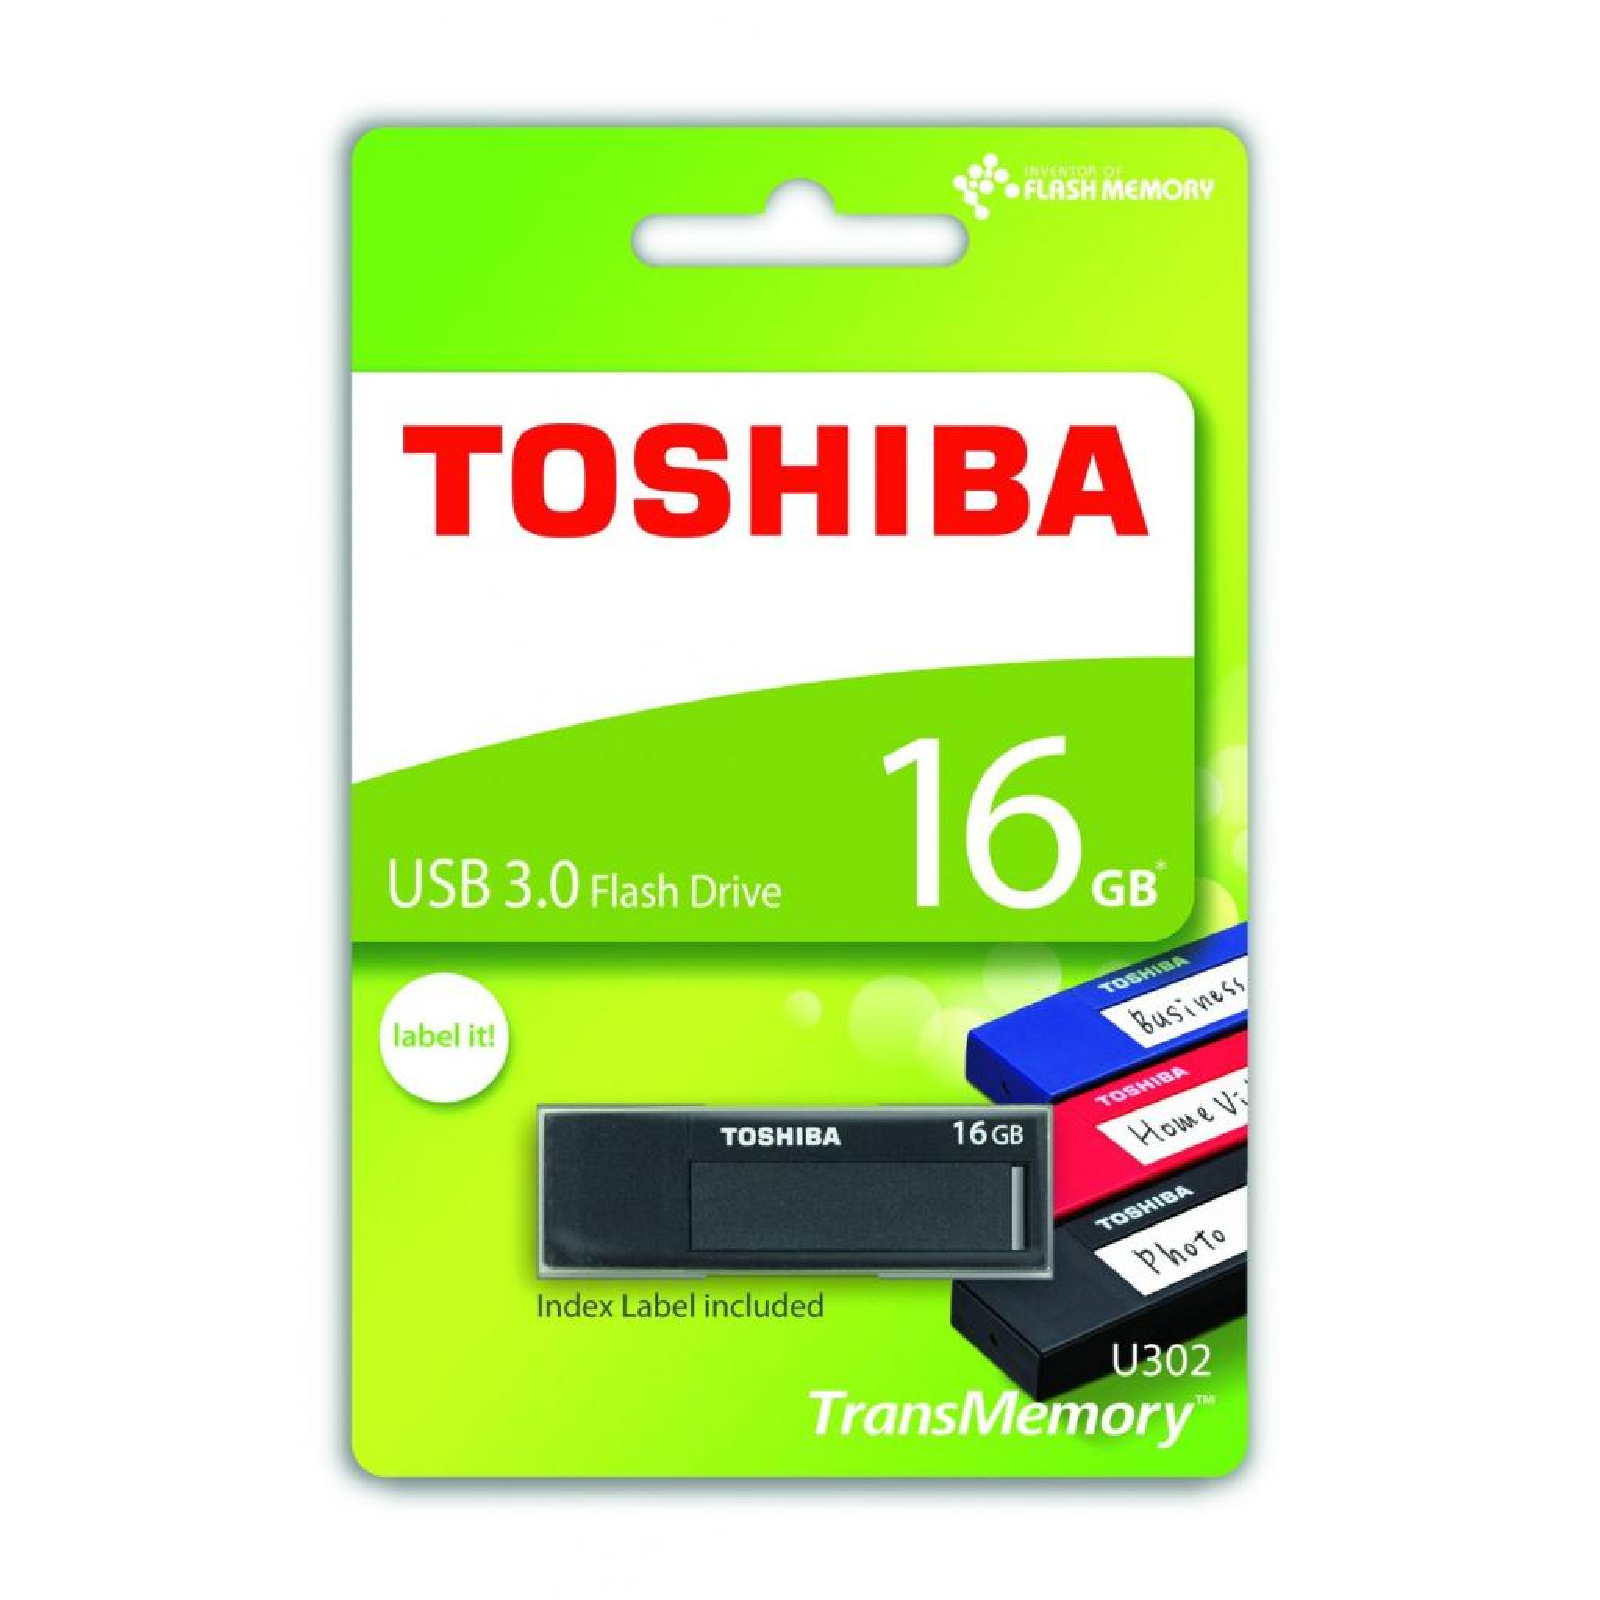 USB флеш накопитель TOSHIBA 16GB Daichi Black USB 3.0 (THN-U302K0160M4) изображение 4